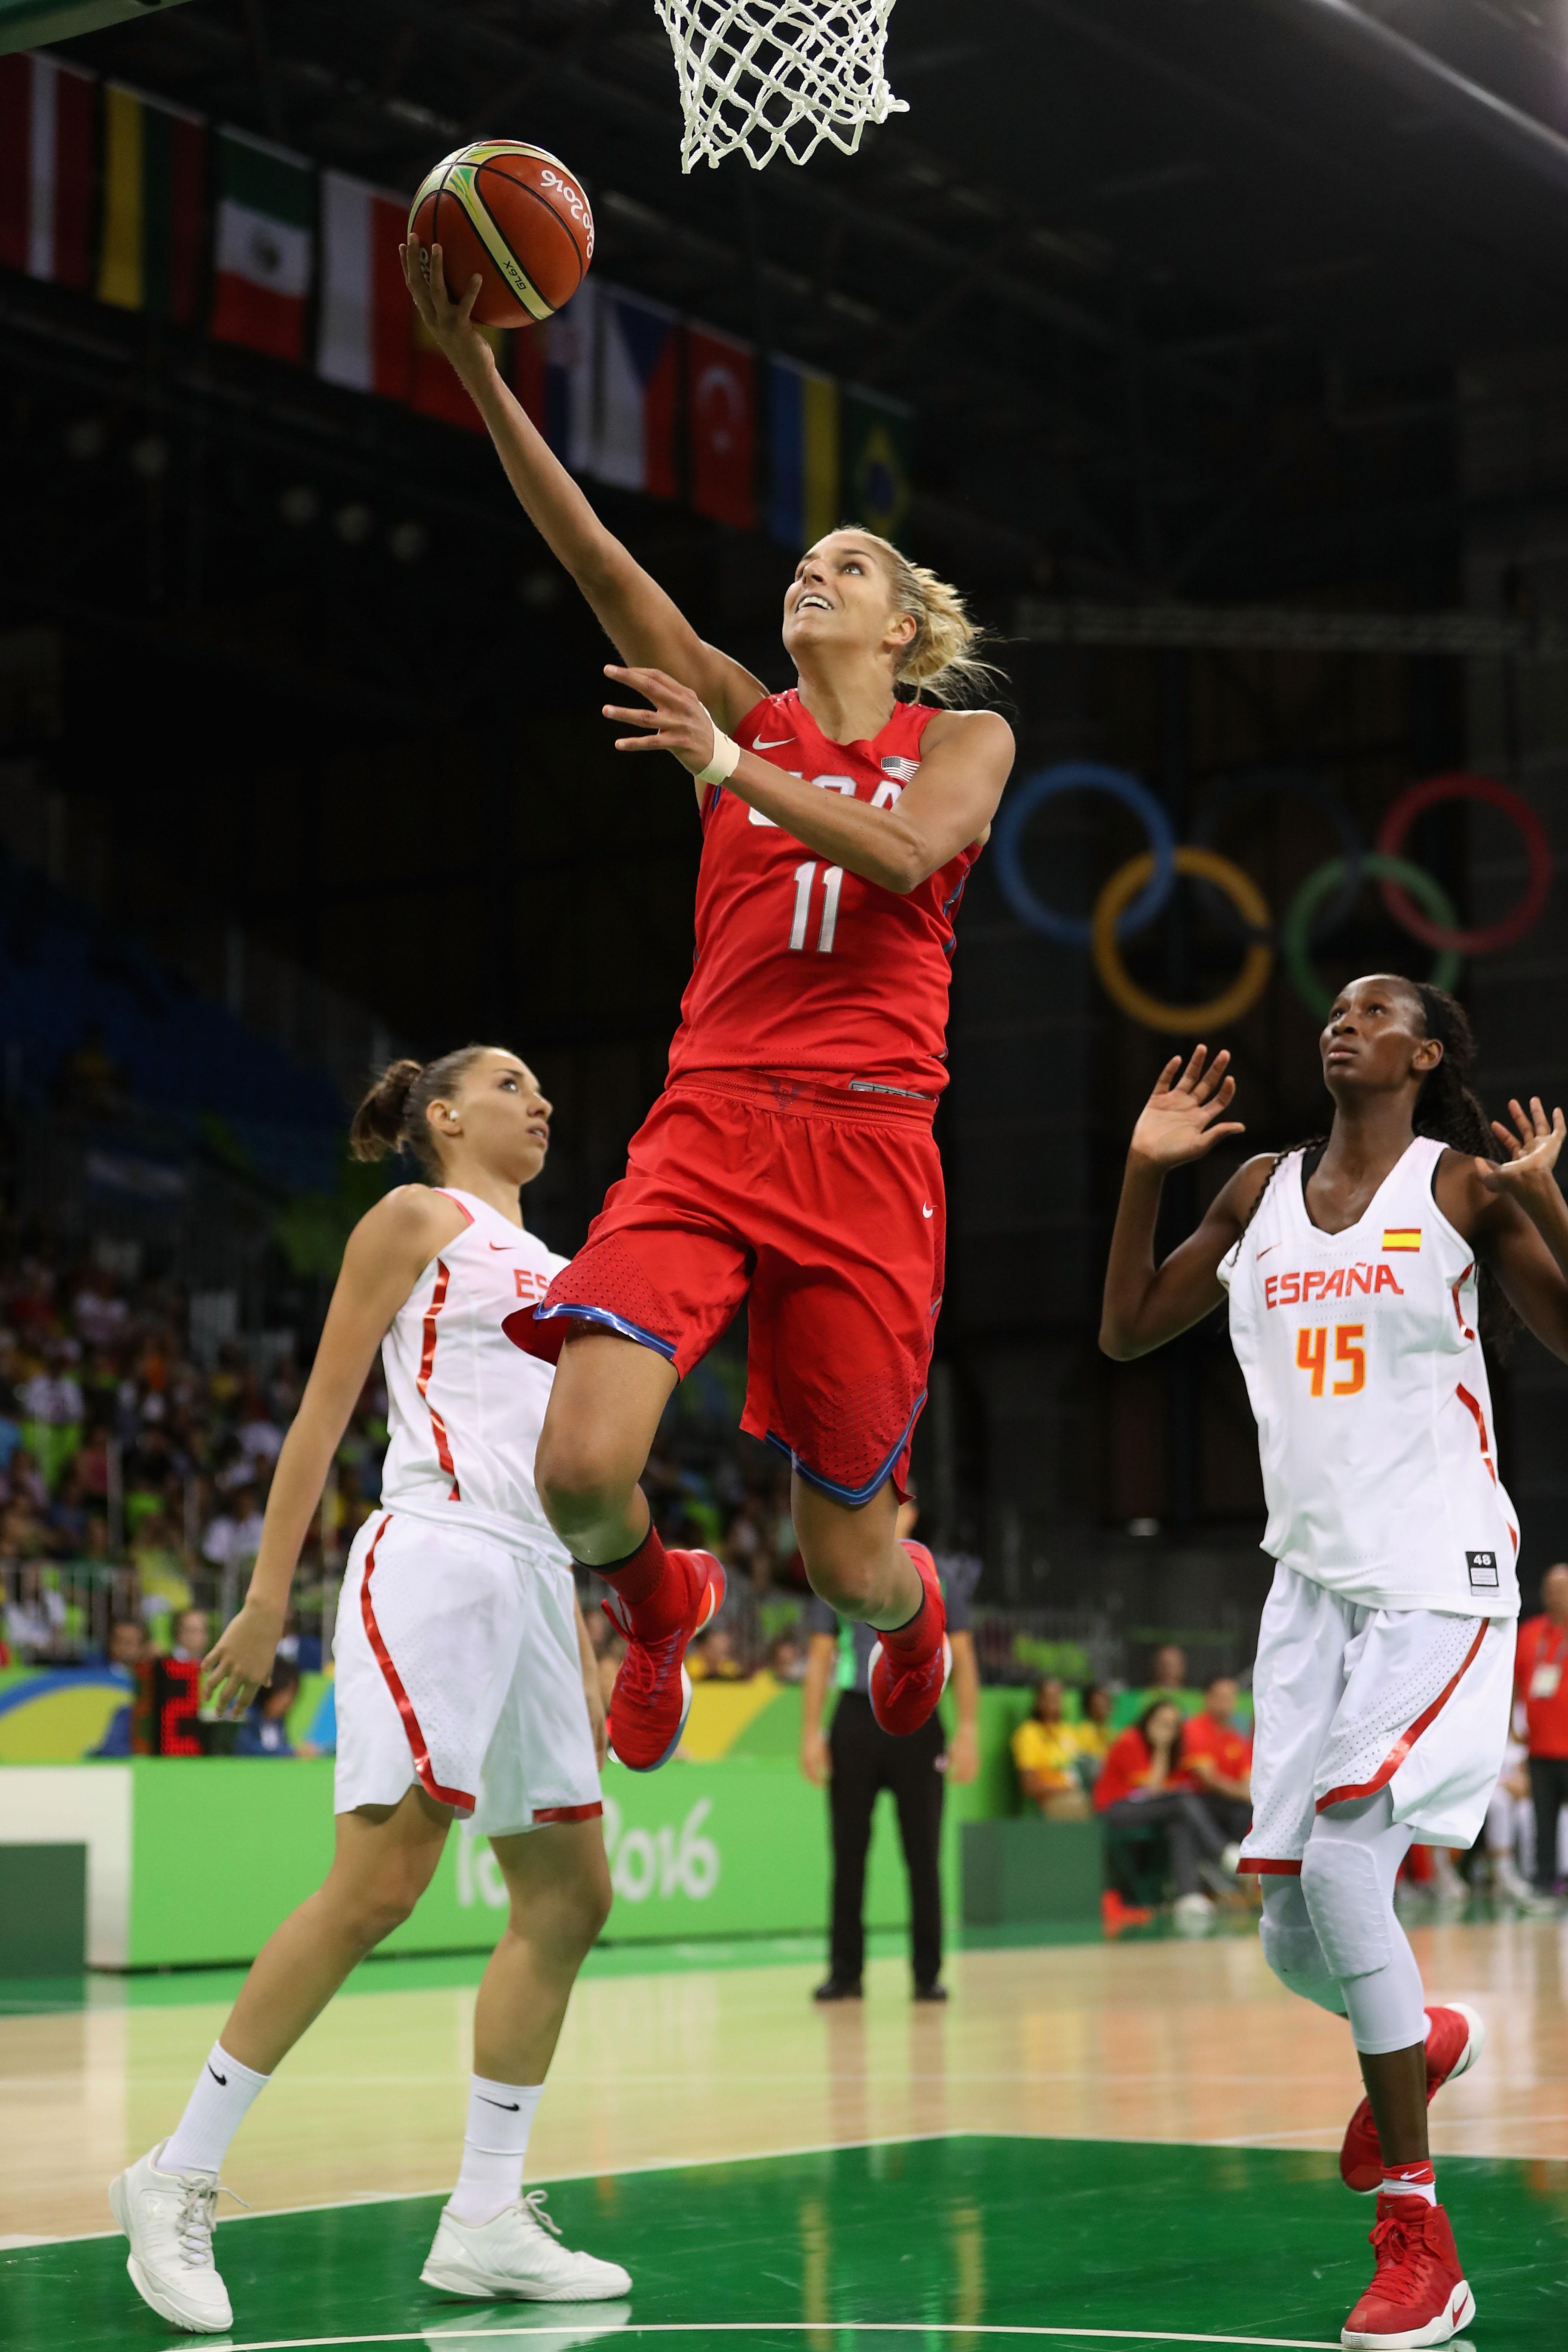 Spain v United States of America - Women's Basketball - Olympics: Day 3